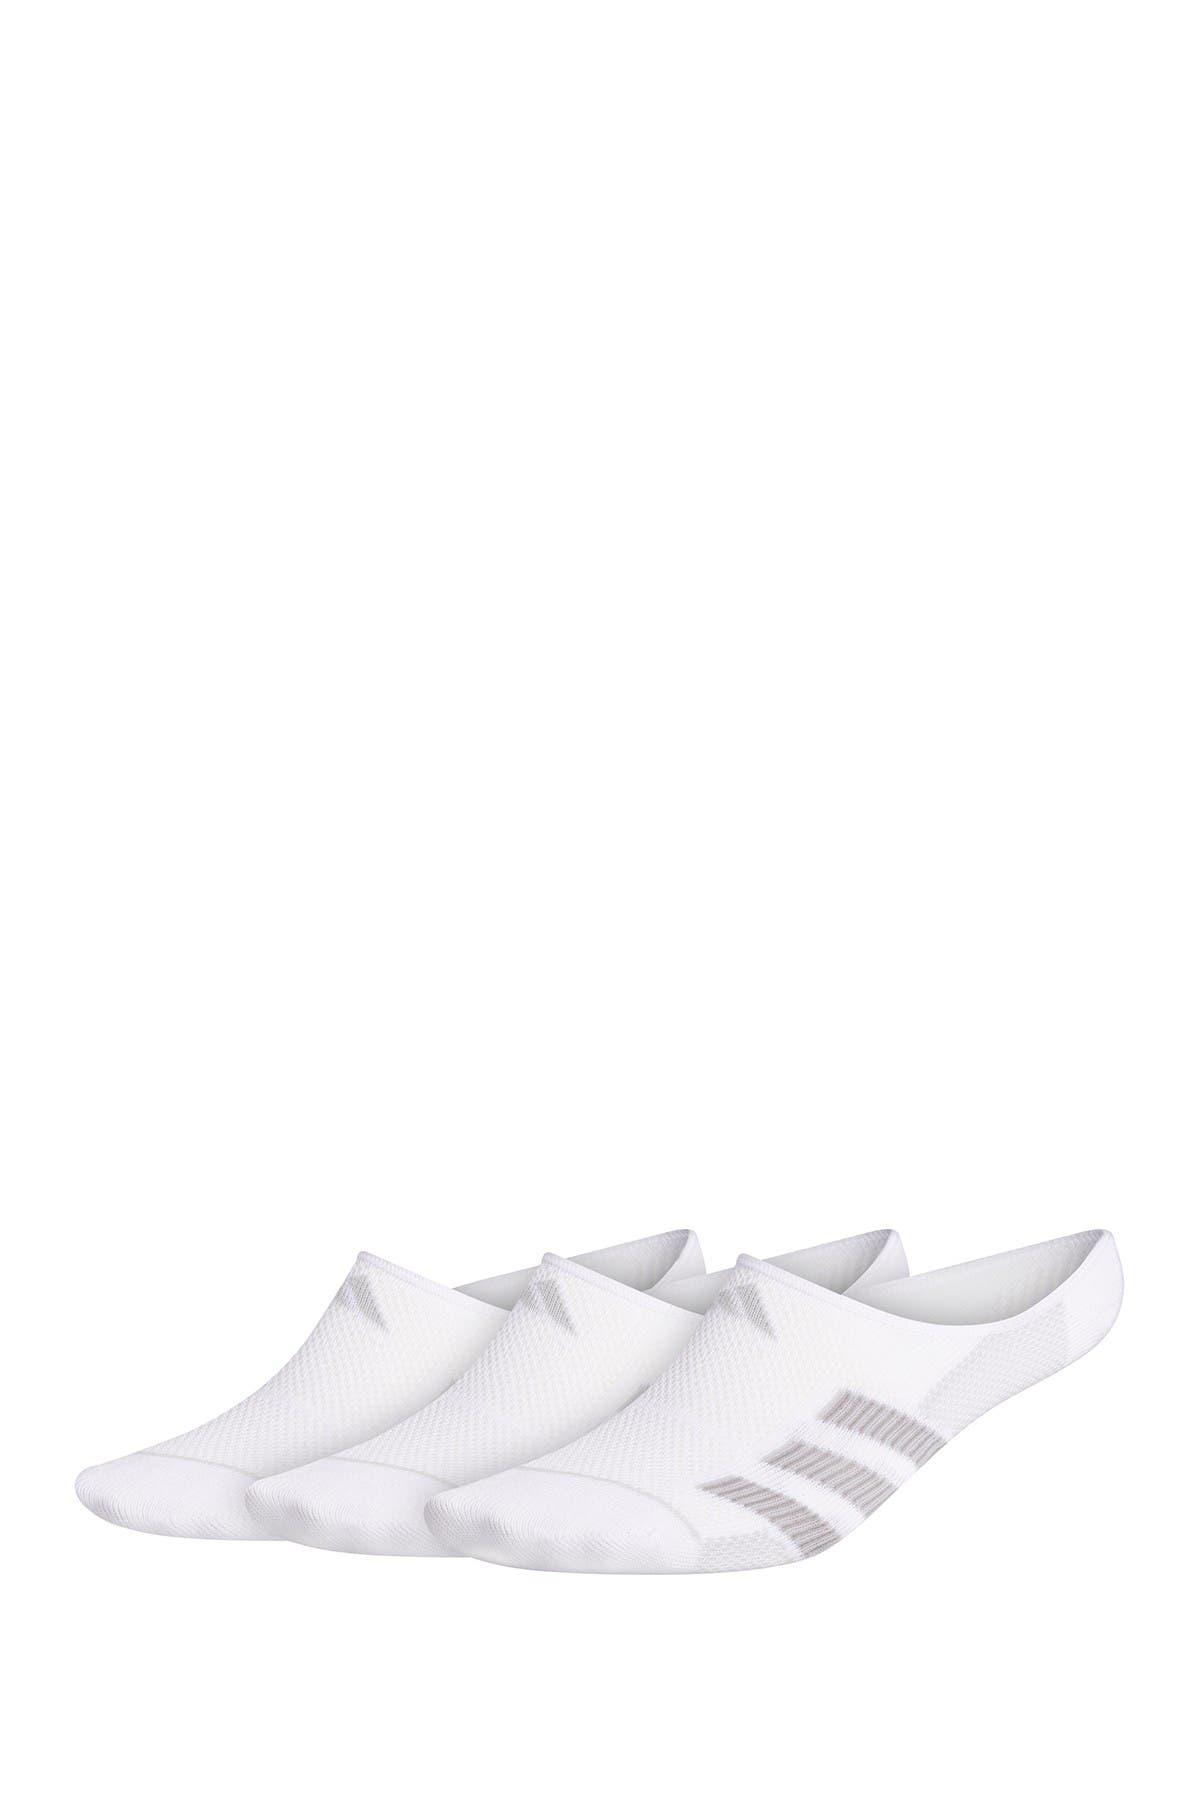 Image of adidas Superlite Super No Show Stripe Socks - Pack of 3